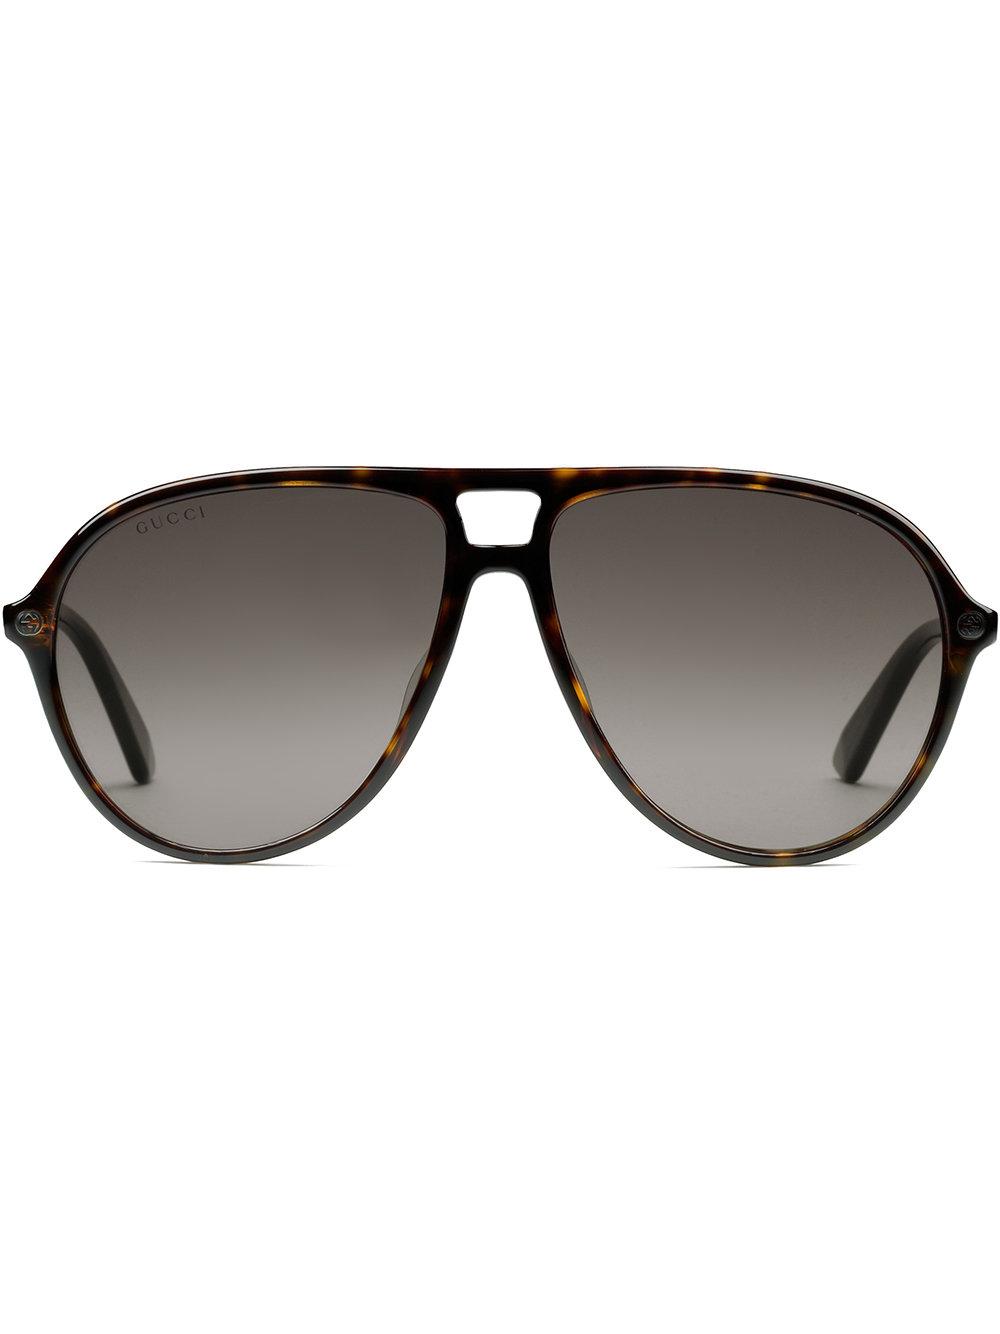 Óculos masculino Gucci (R$ 870) compre aqui